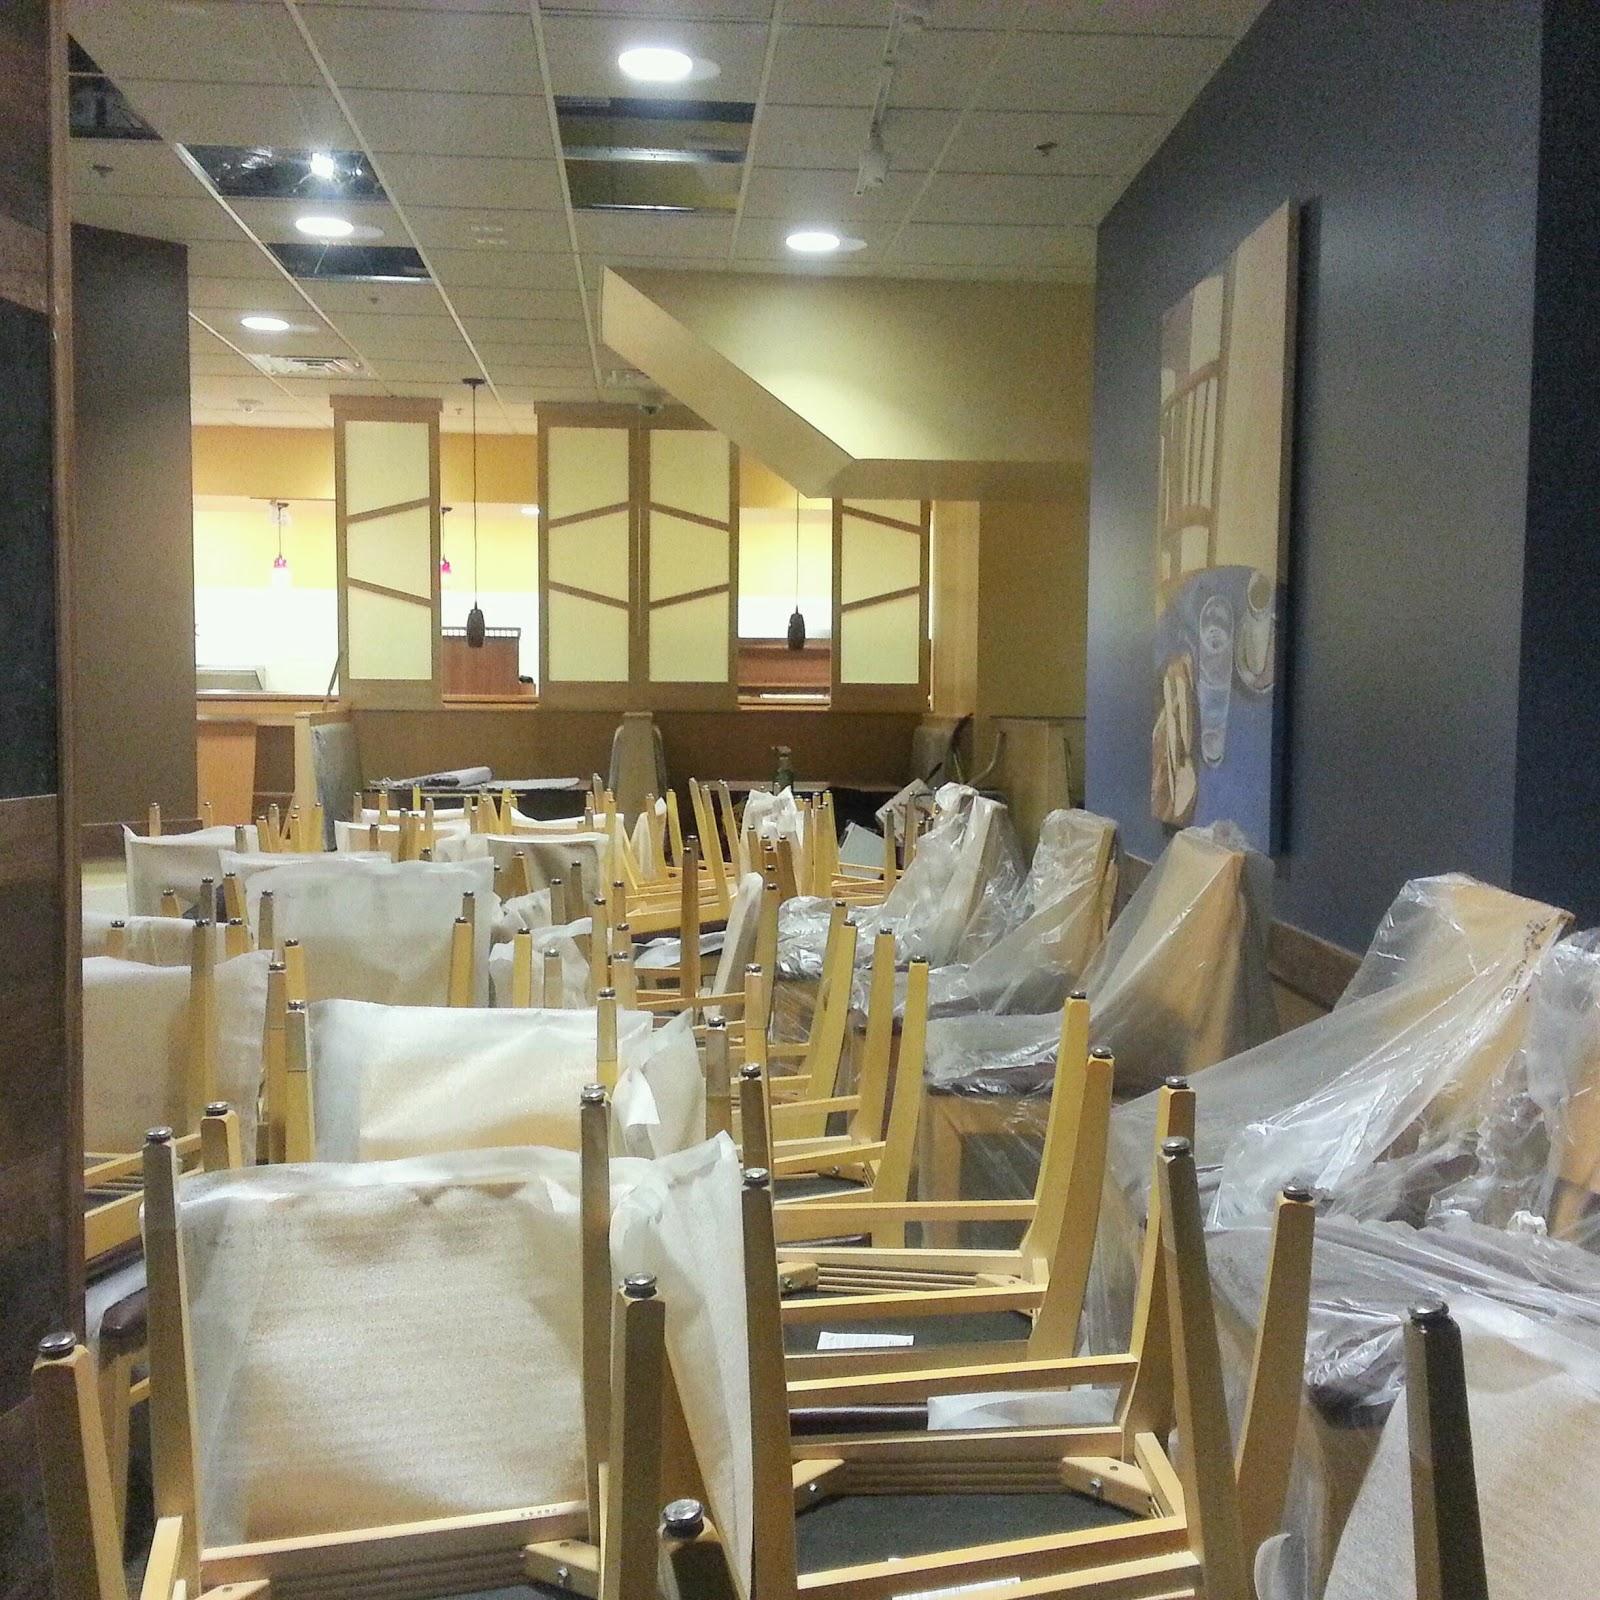 Robert Dyer @ Bethesda Row: PANERA BREAD BETHESDA CONSTRUCTION ...